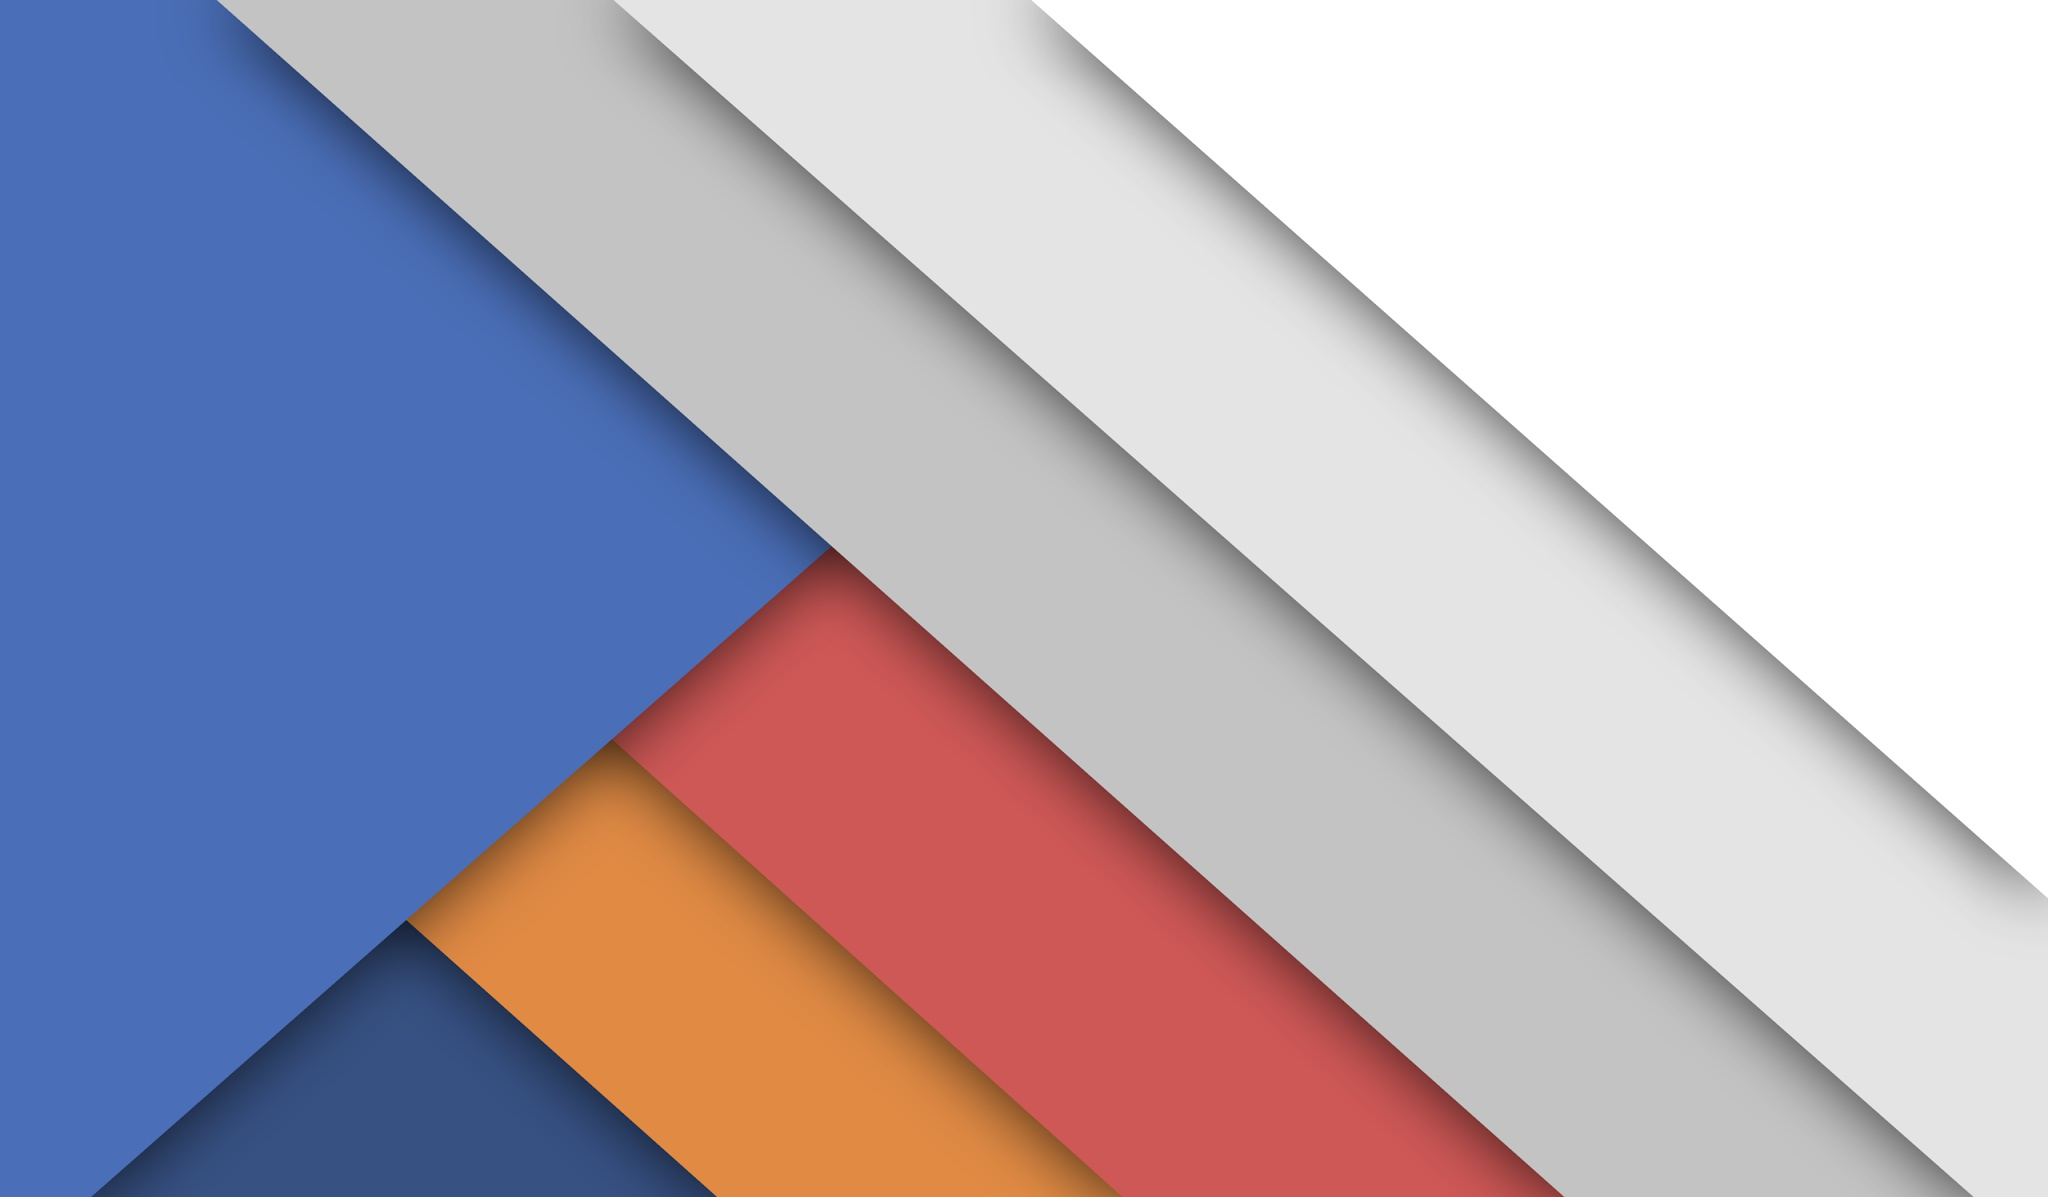 Abstract lines digital art material design hd abstract for Material design wallpaper 4k